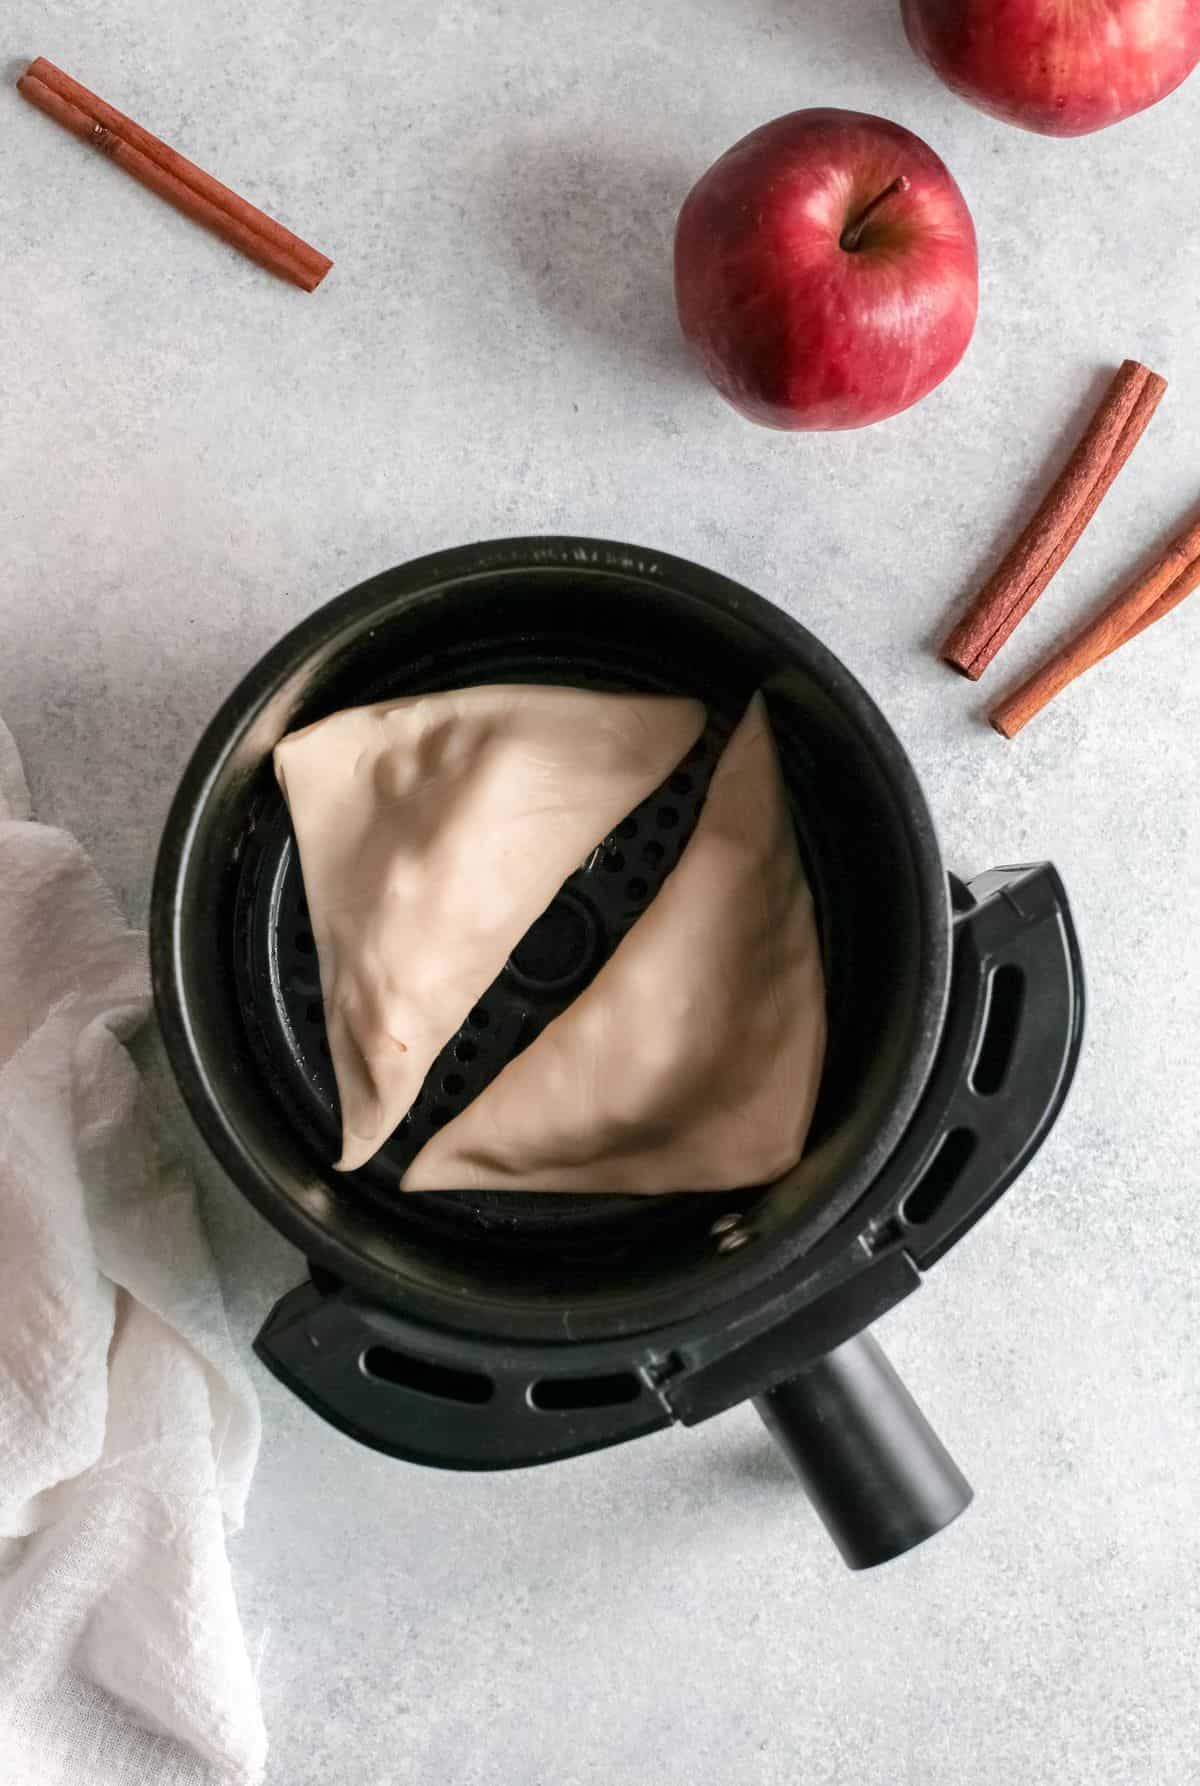 McDonald's Apple Pie in Air Fryer Basket